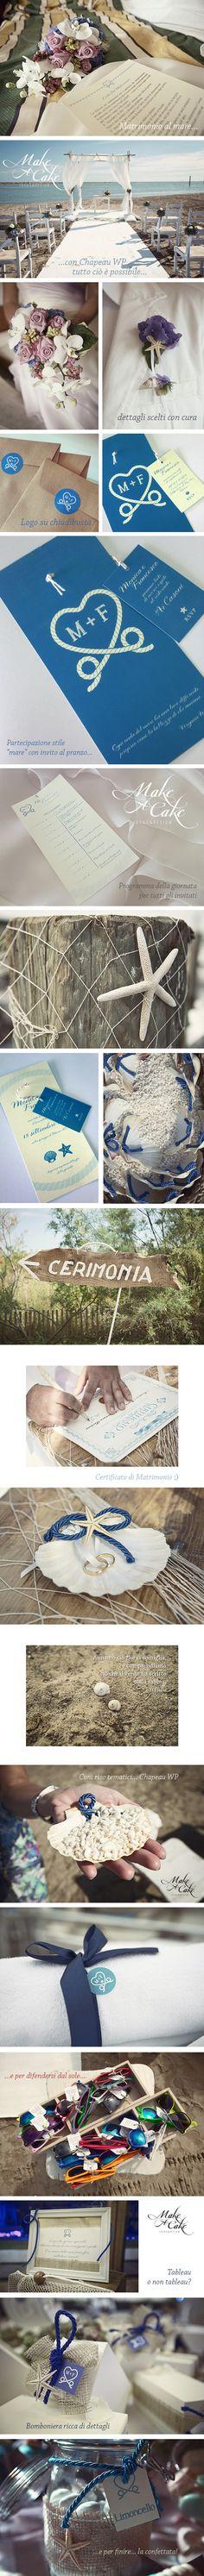 Matrimonio Mare wedding seasidewedding sea wedding ideas inspiration stationery you can find it at www.makeacake.it